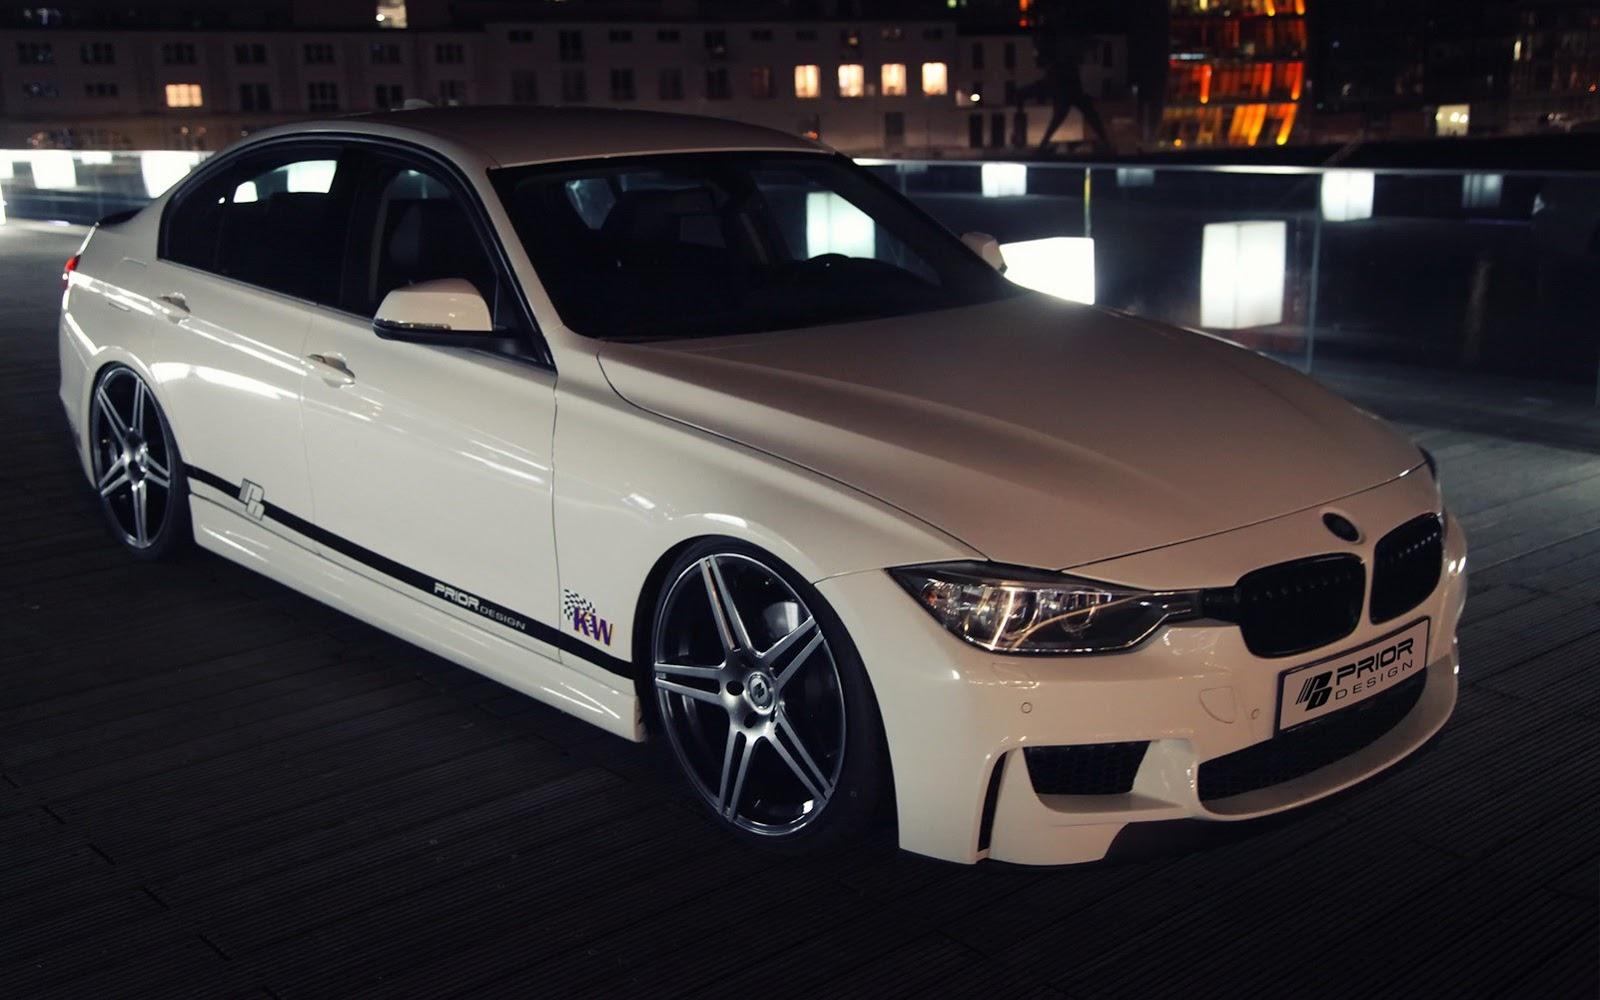 F30 BMW 3 Series by Prior Design